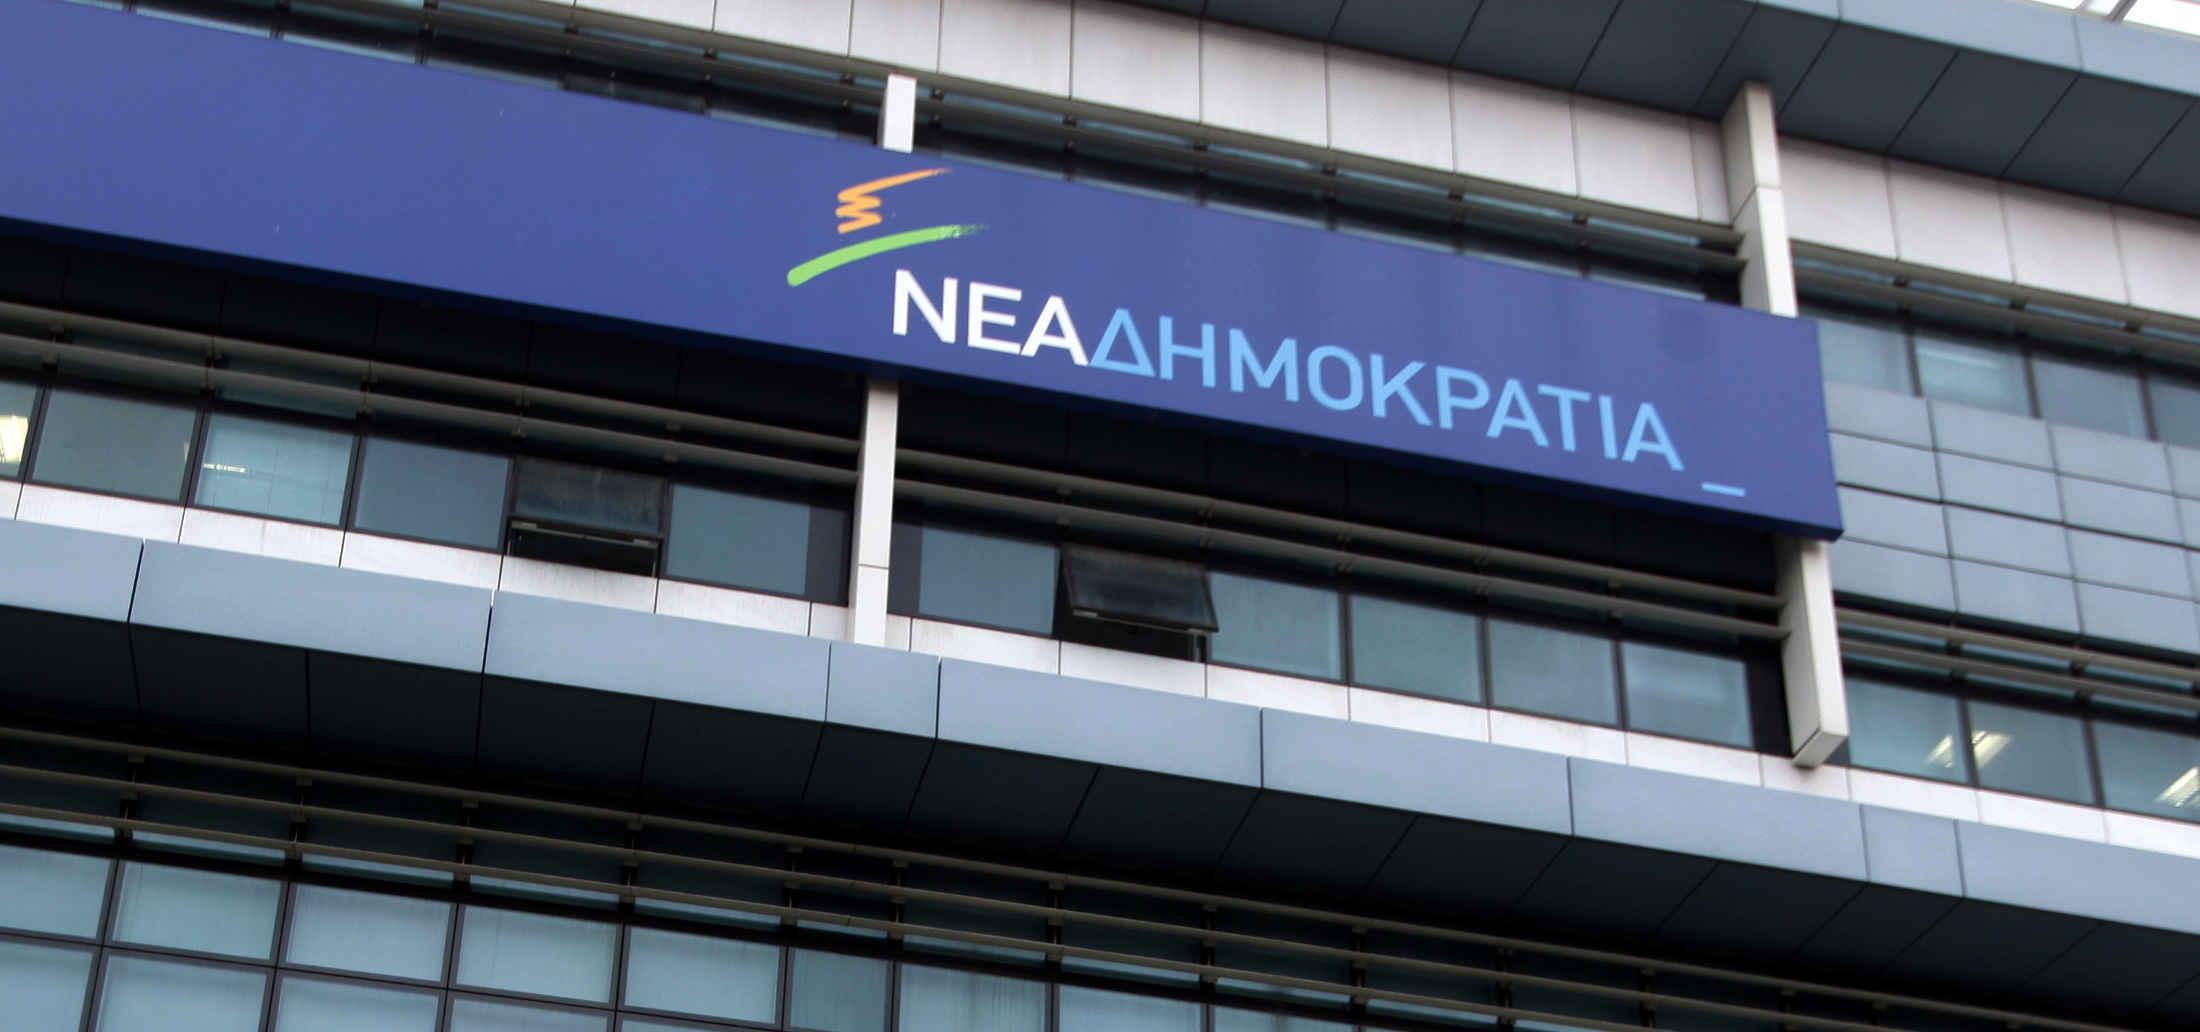 http://www.eleftherostypos.gr/wp-content/uploads/2016/06/nea_dimokratia_aftodioikisi.jpg